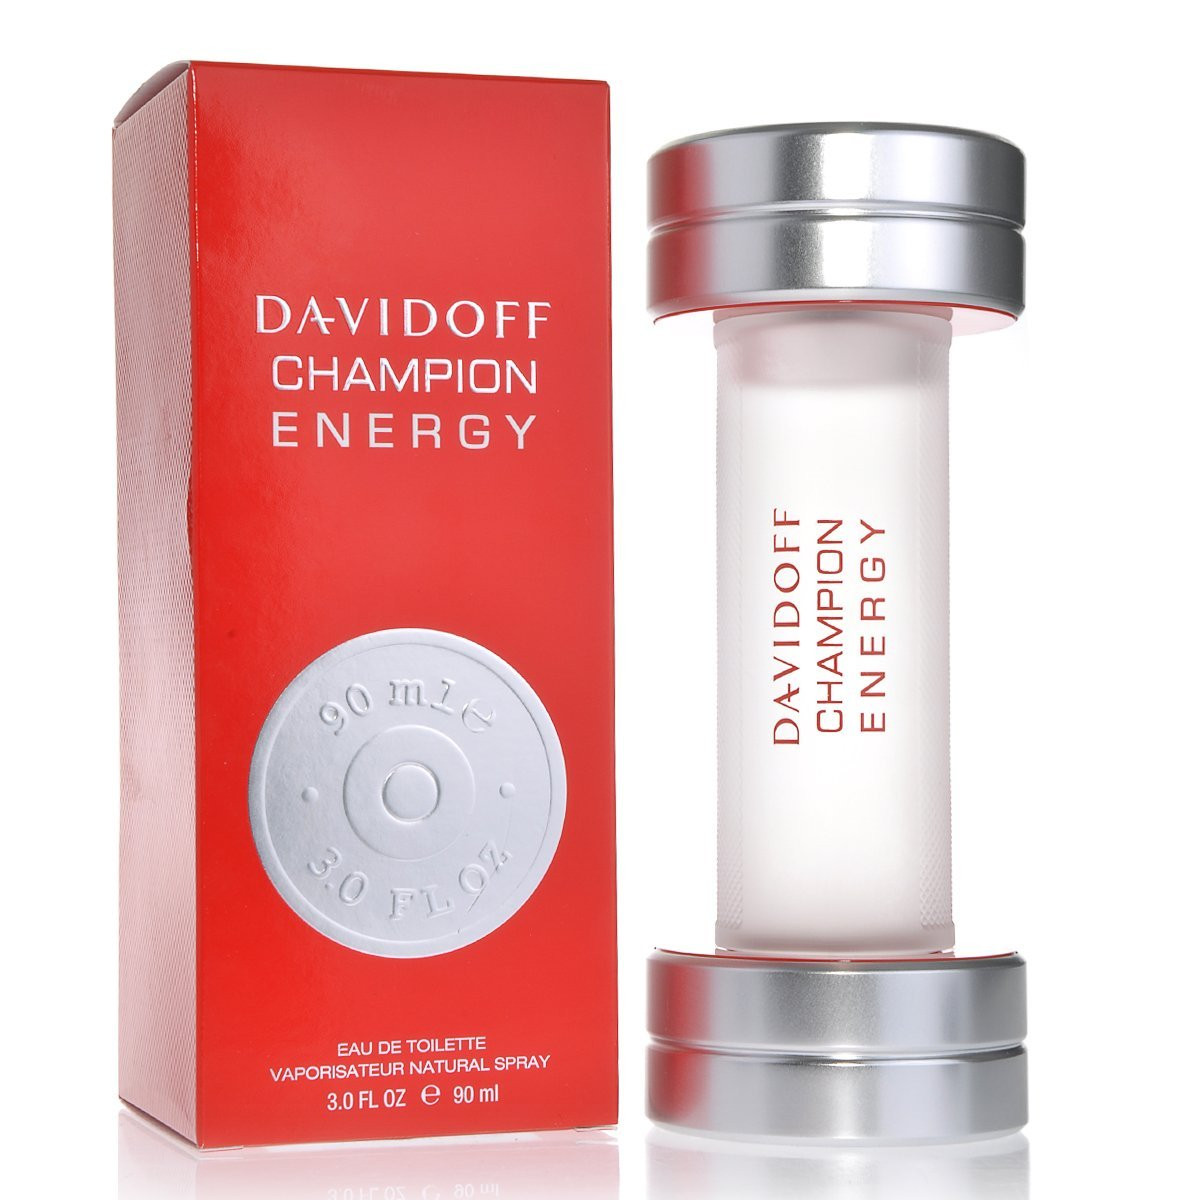 Davidoff Champion Energy 50ml